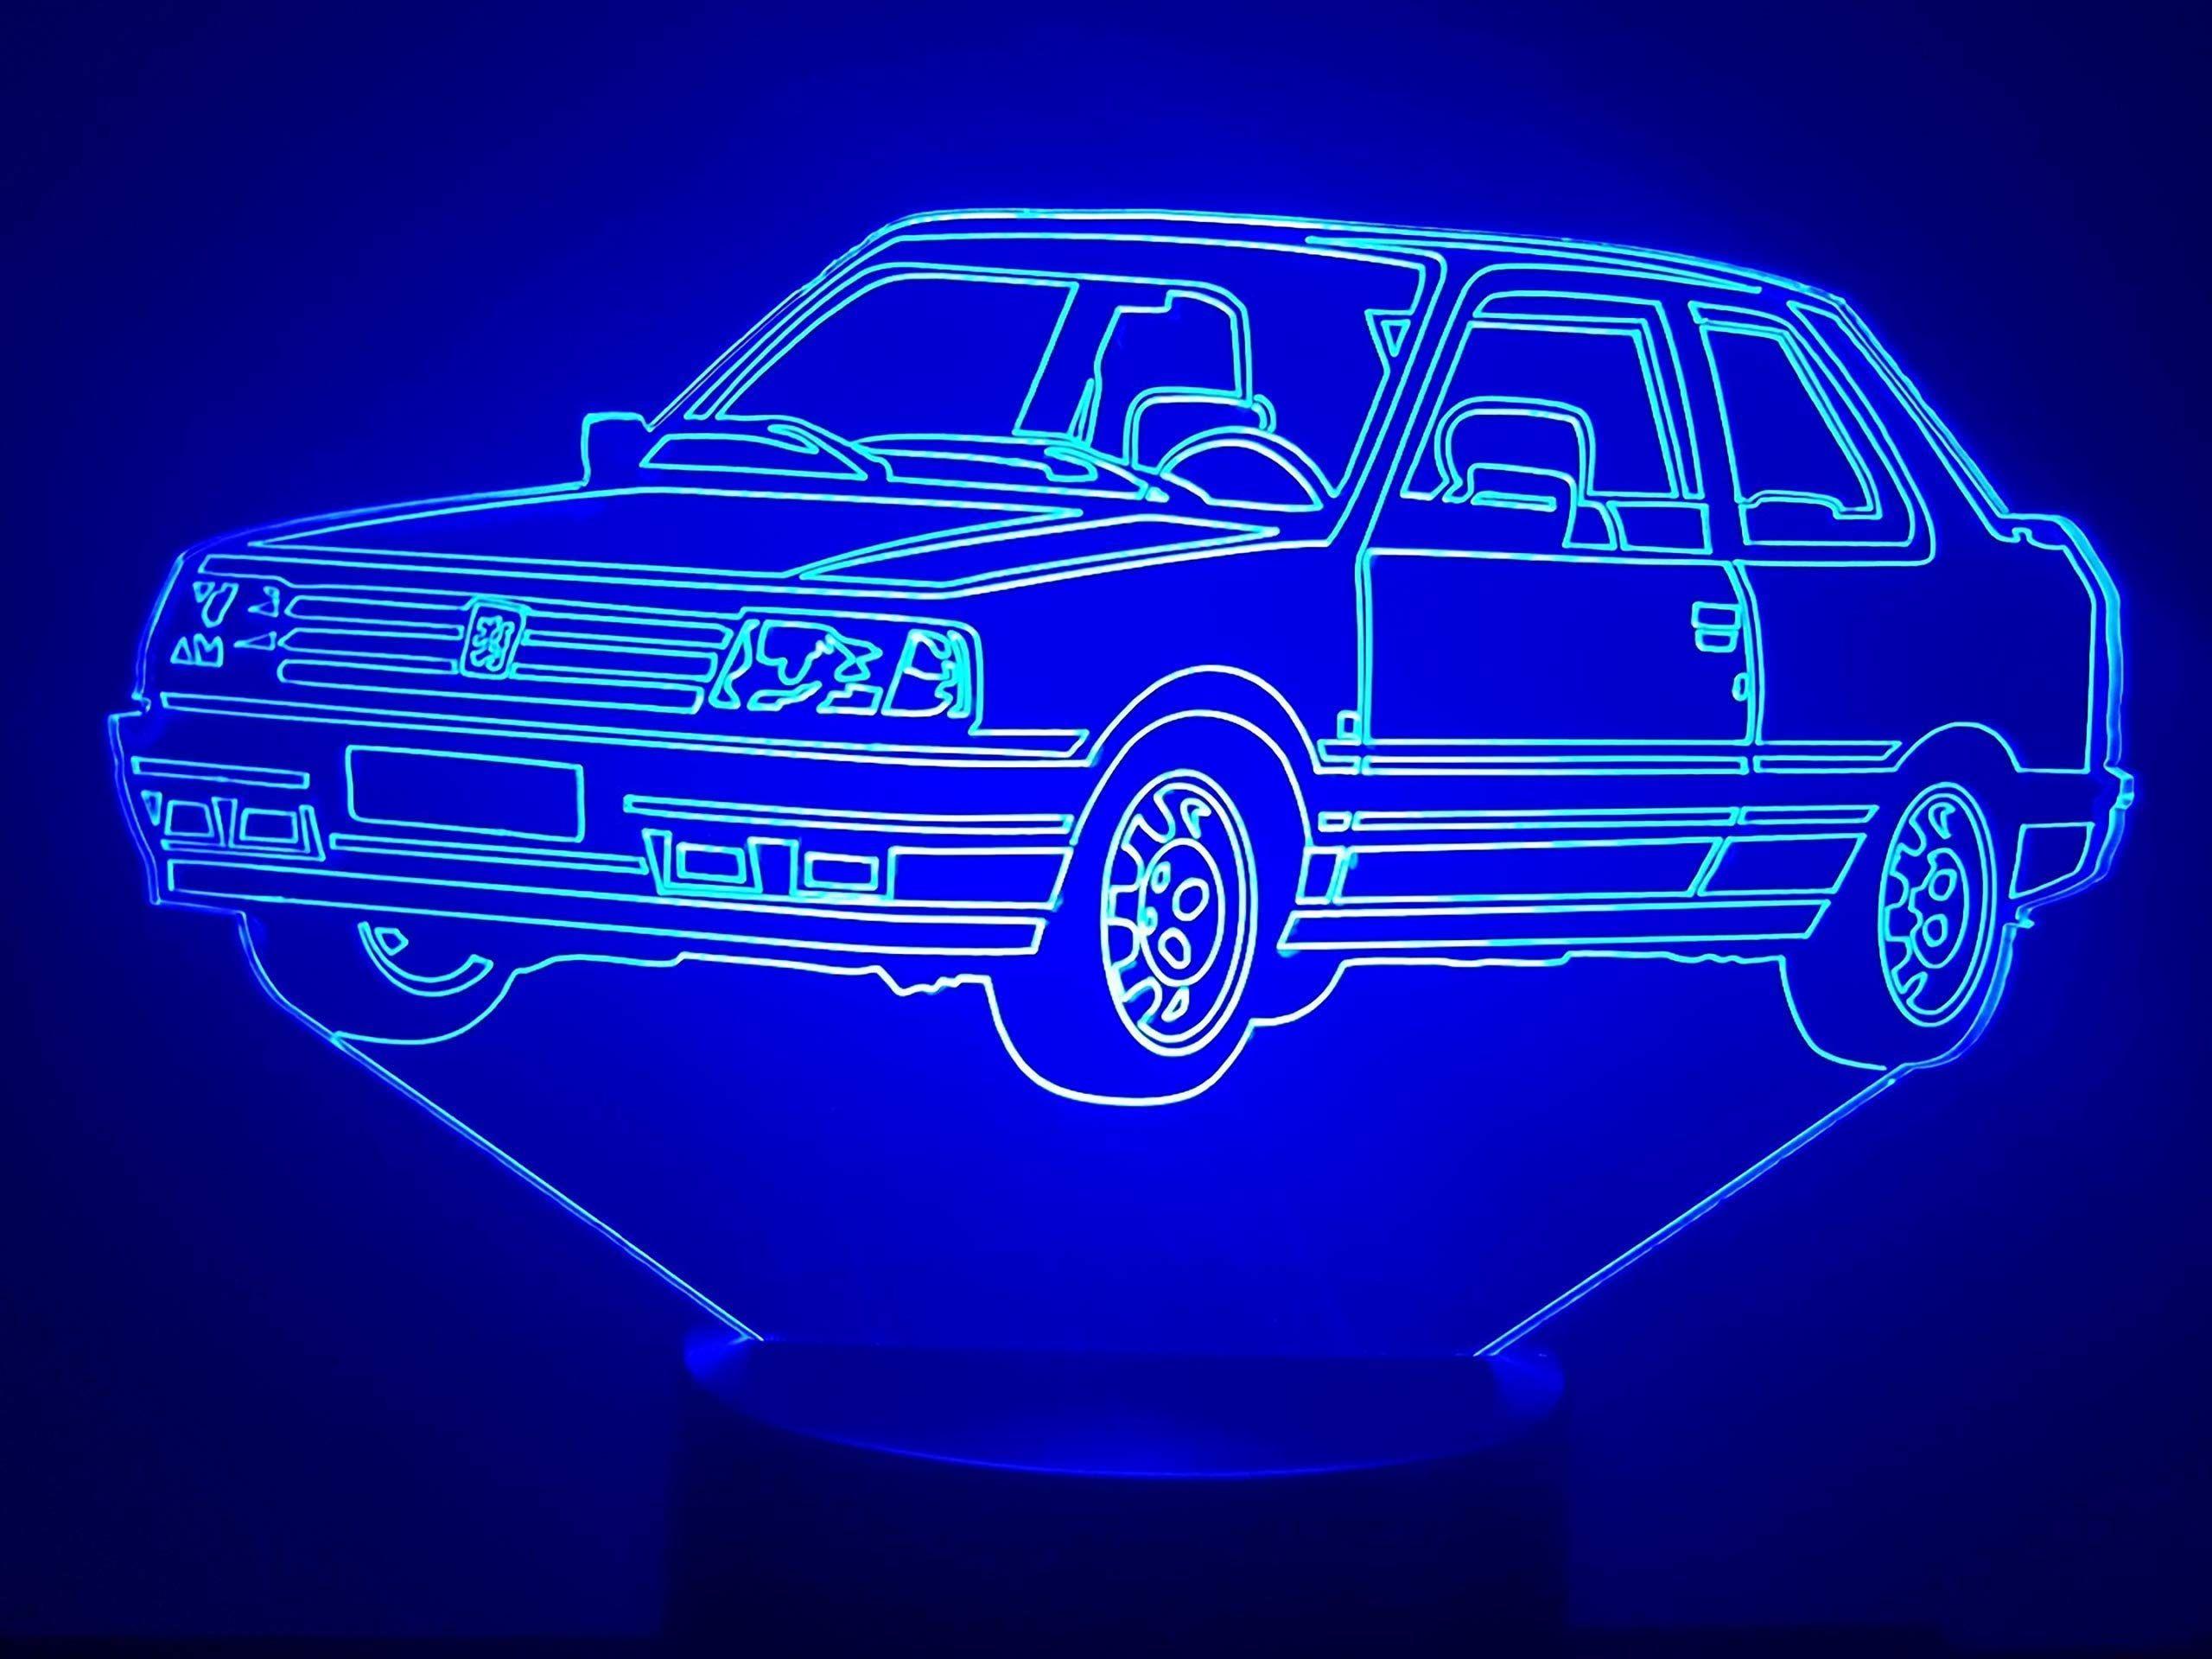 Peugeot 309 Gti 3d Lampe Led Peugeot Gti Led Lampe Typografie